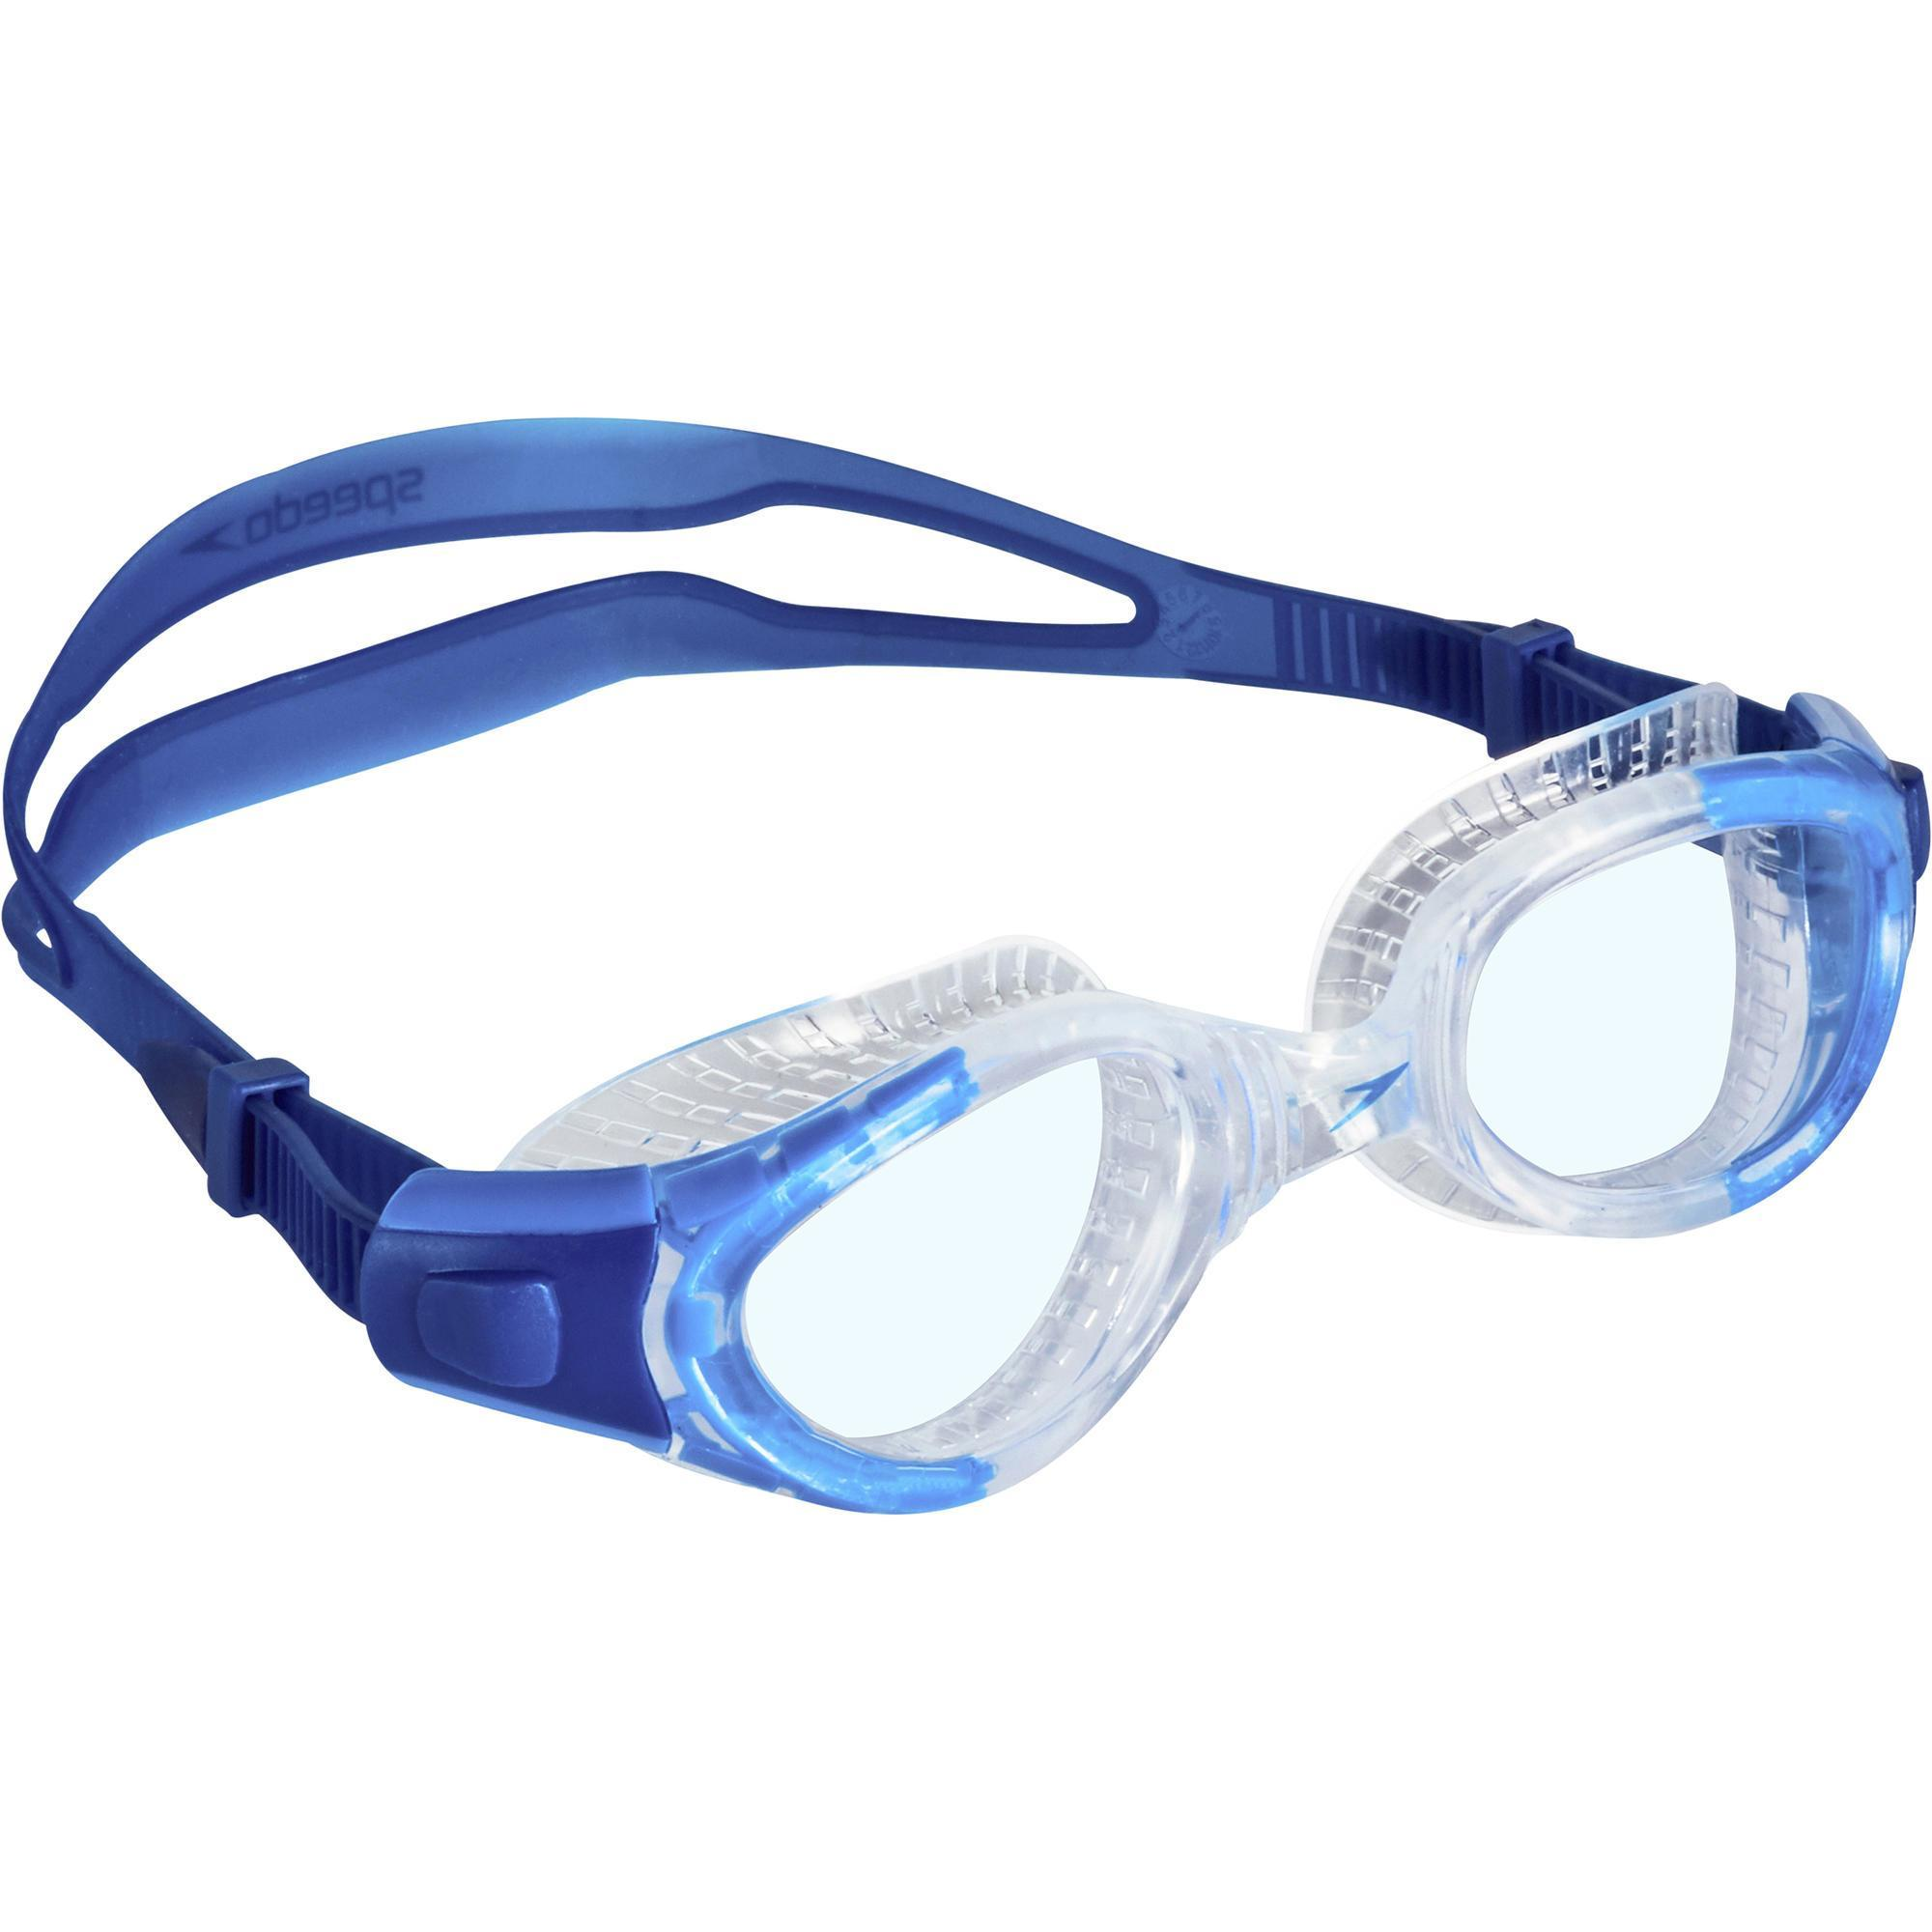 Speedo zwembril futura biofuse flexiseal helder decathlon for Trampoline piscine decathlon